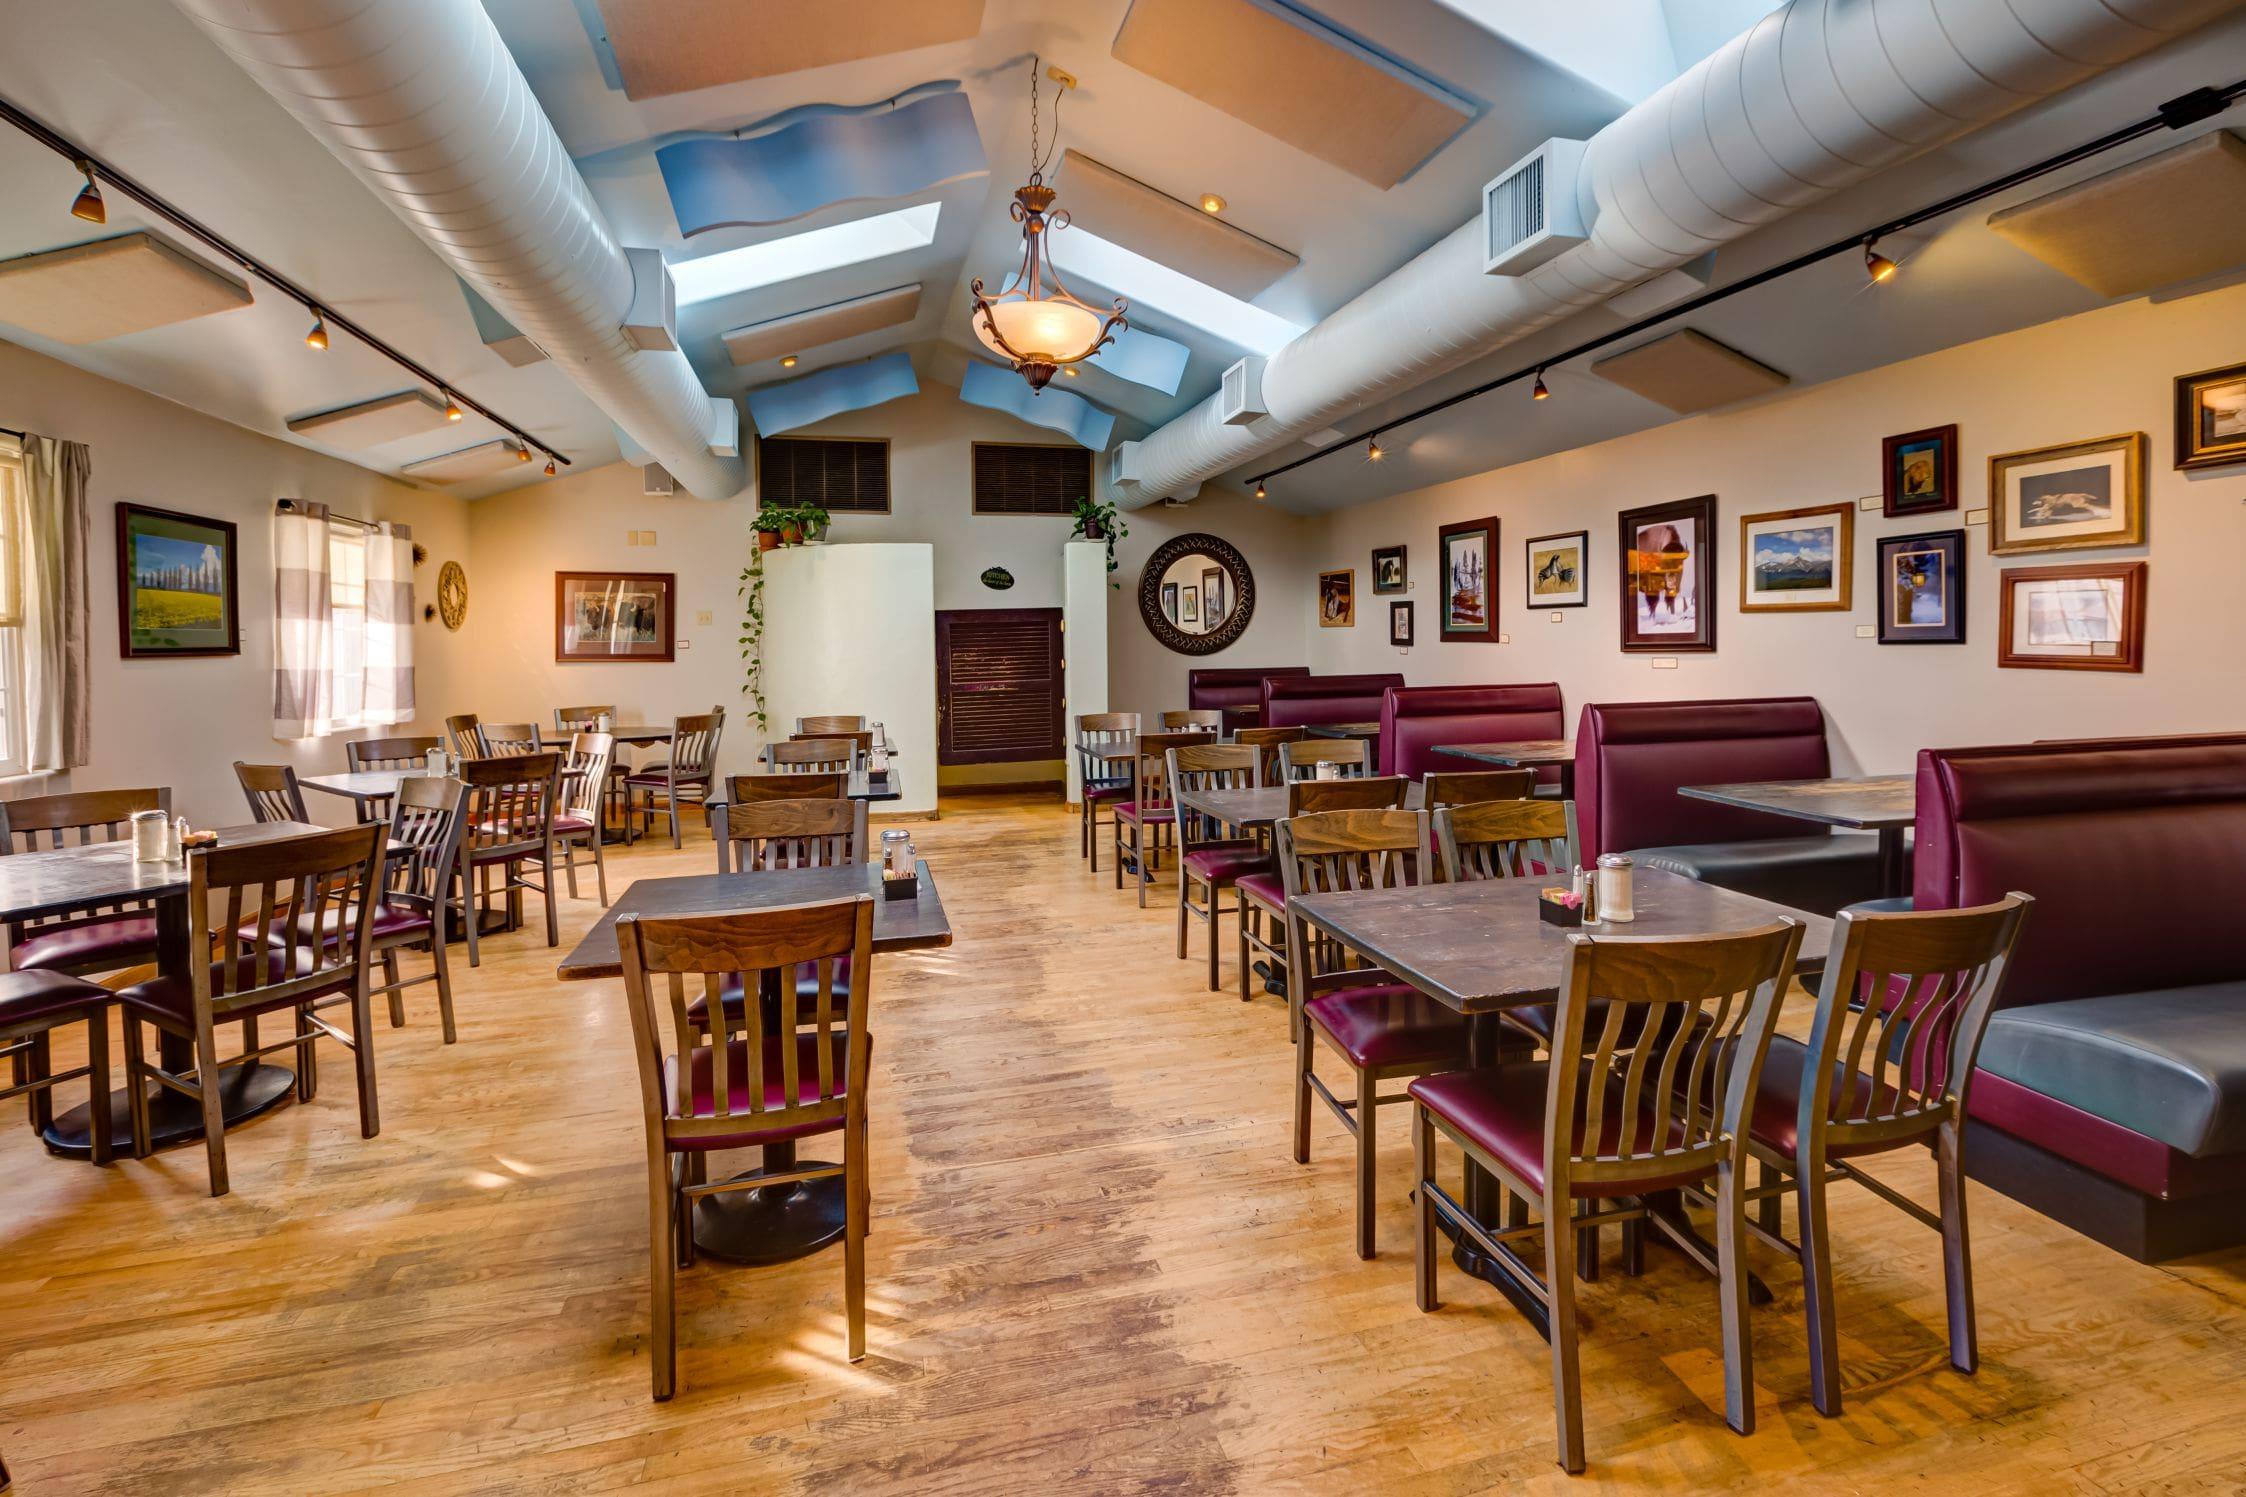 Cozy-Cottage-Restaurant-Denver-0001-min